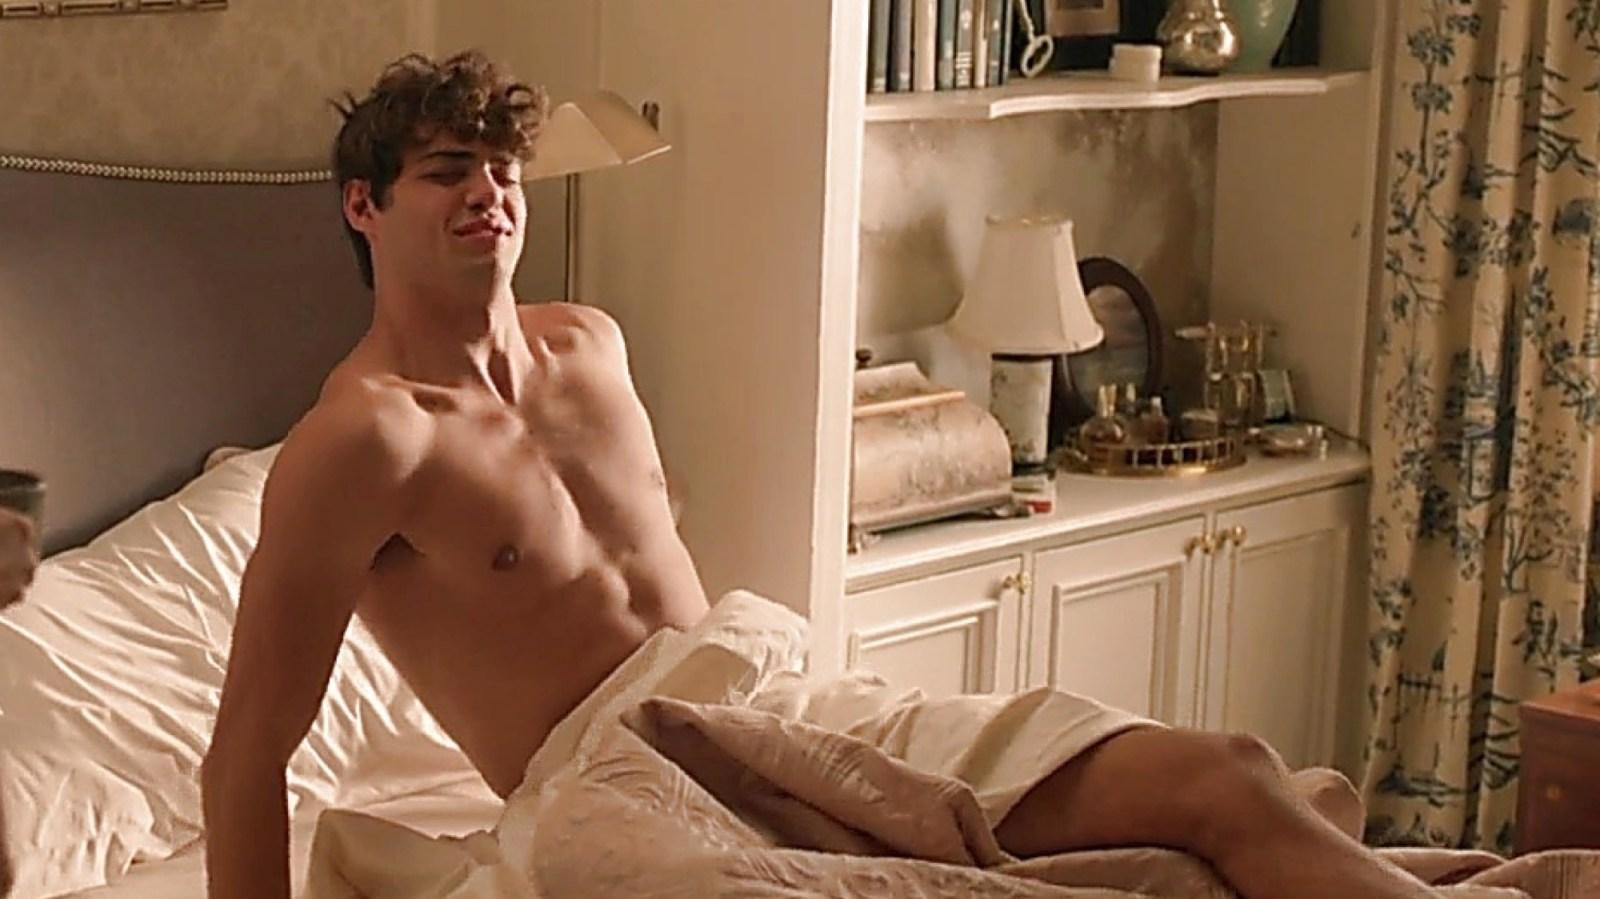 Noah Centineo Shirtless